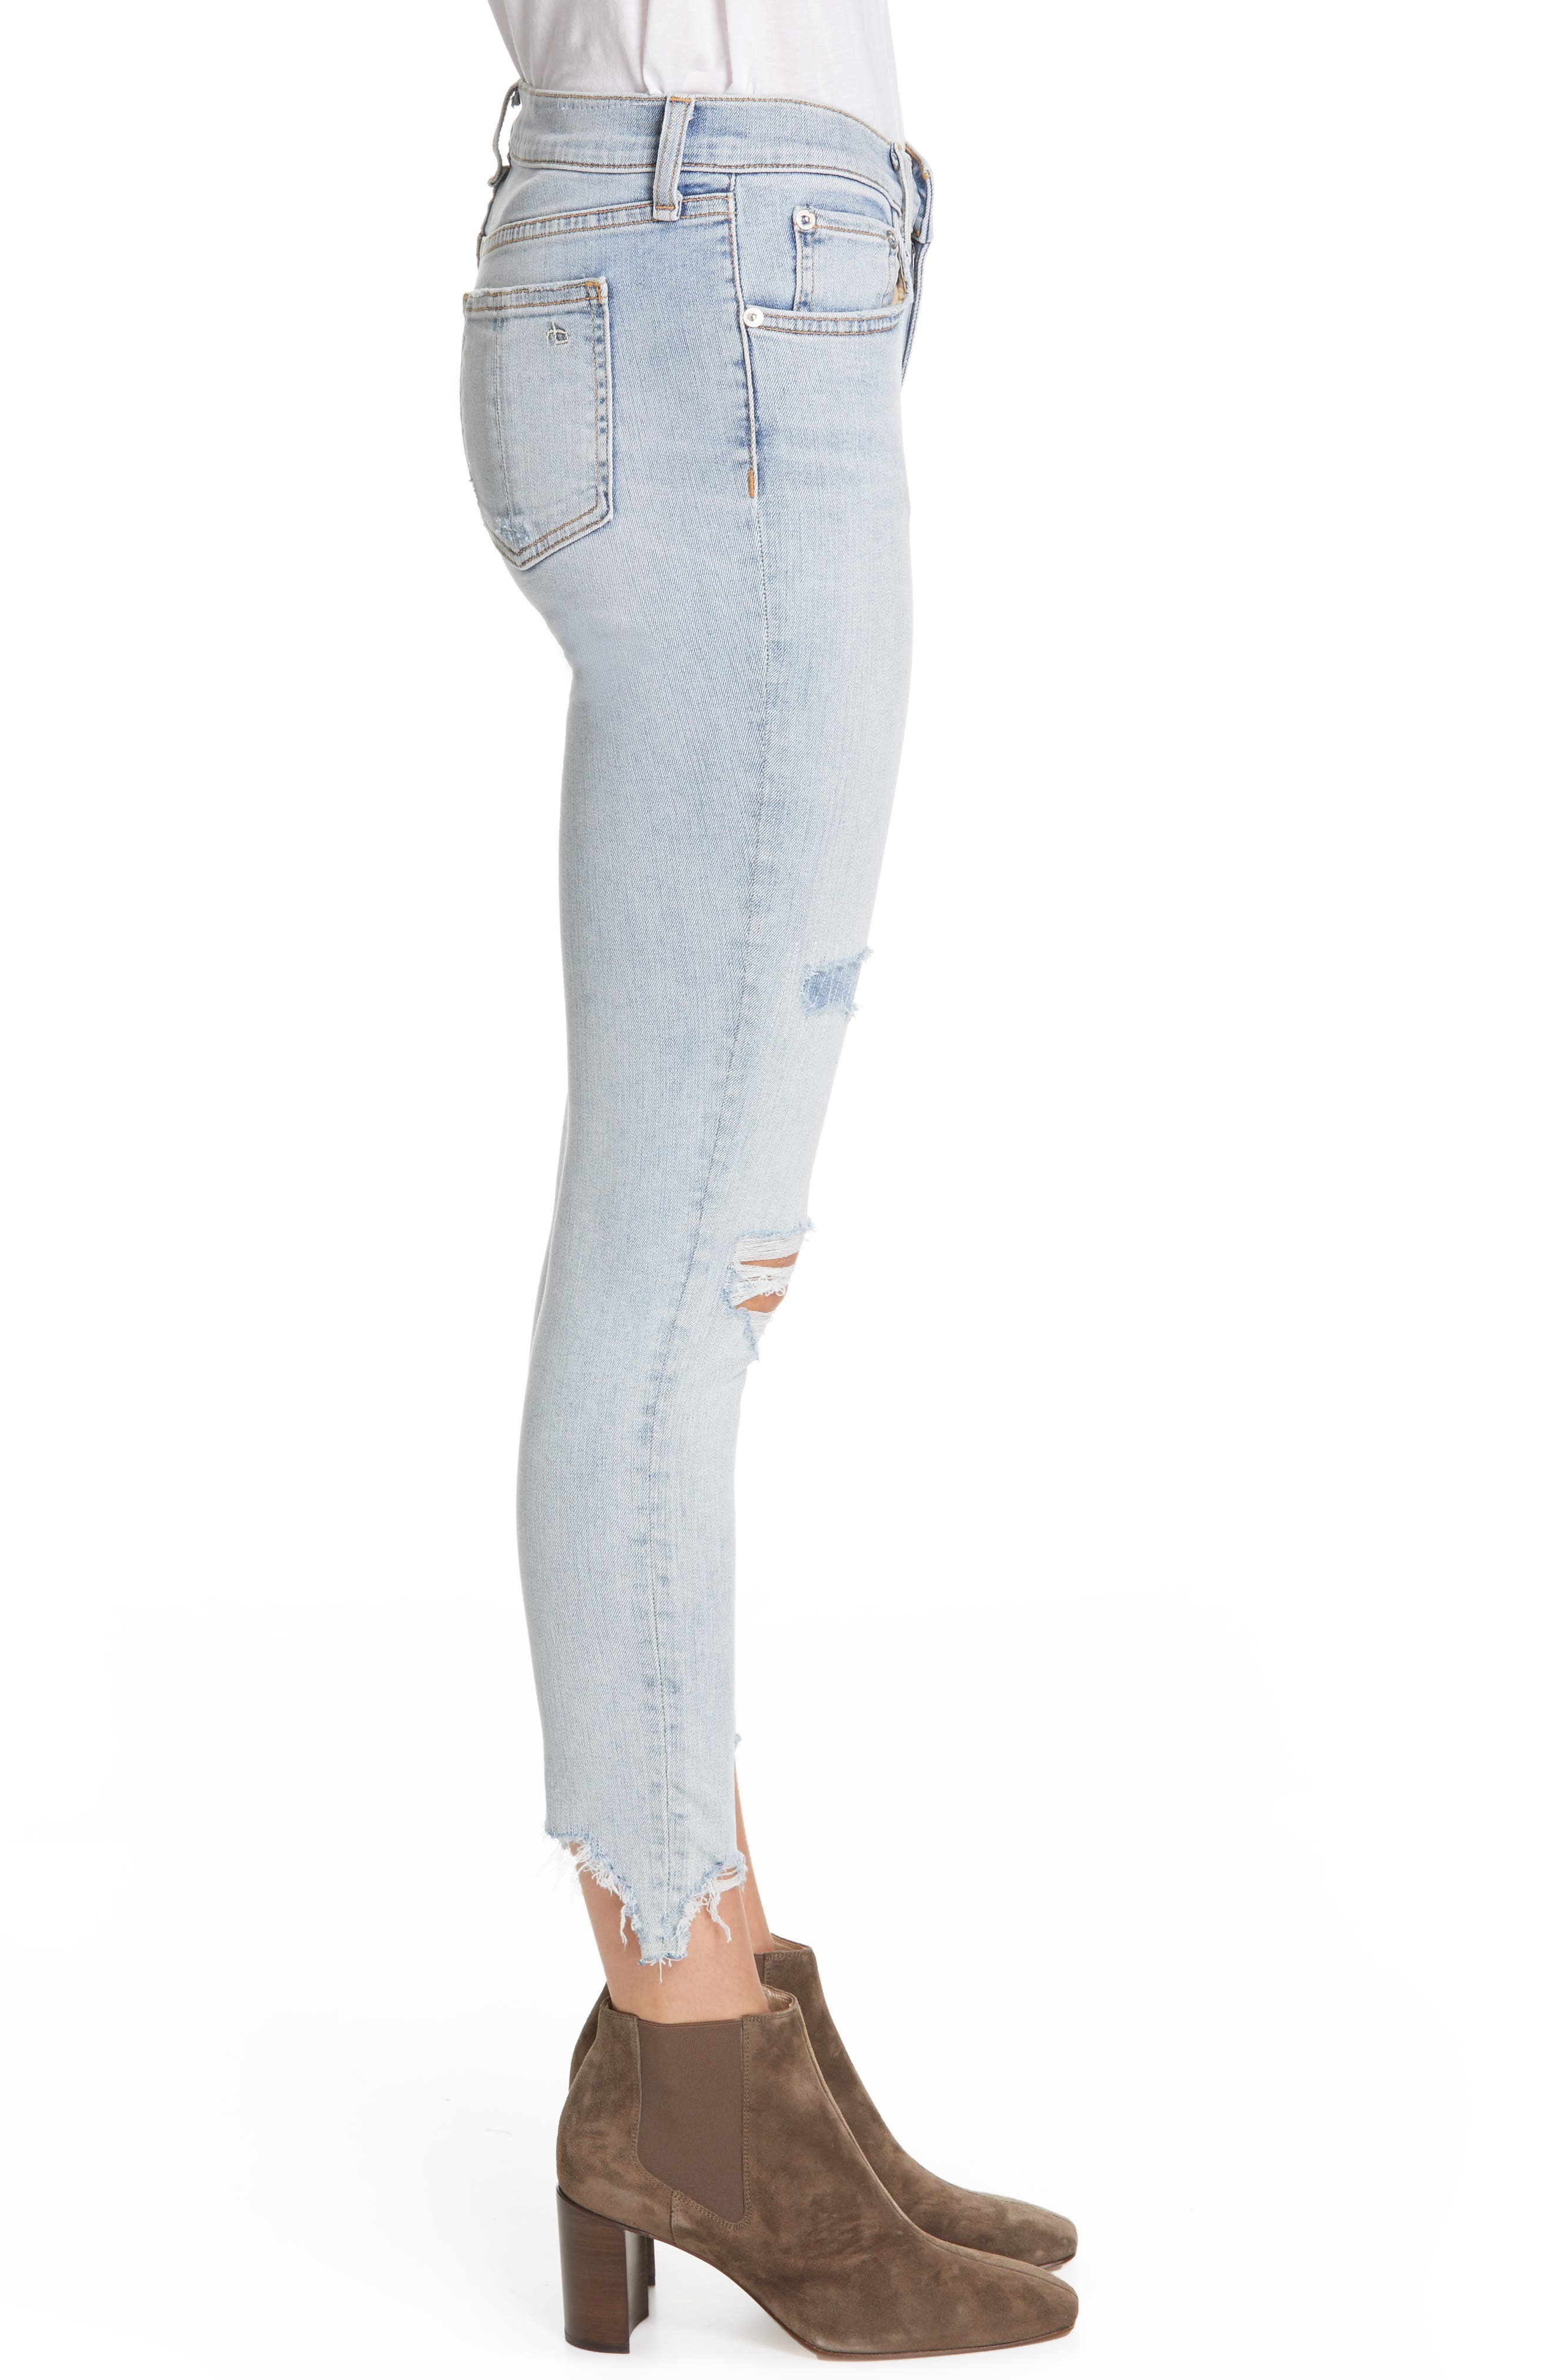 RAG & BONE,                             JEAN Ripped Ankle Skinny Jeans,                             Alternate thumbnail 4, color,                             LYNN W HOLES